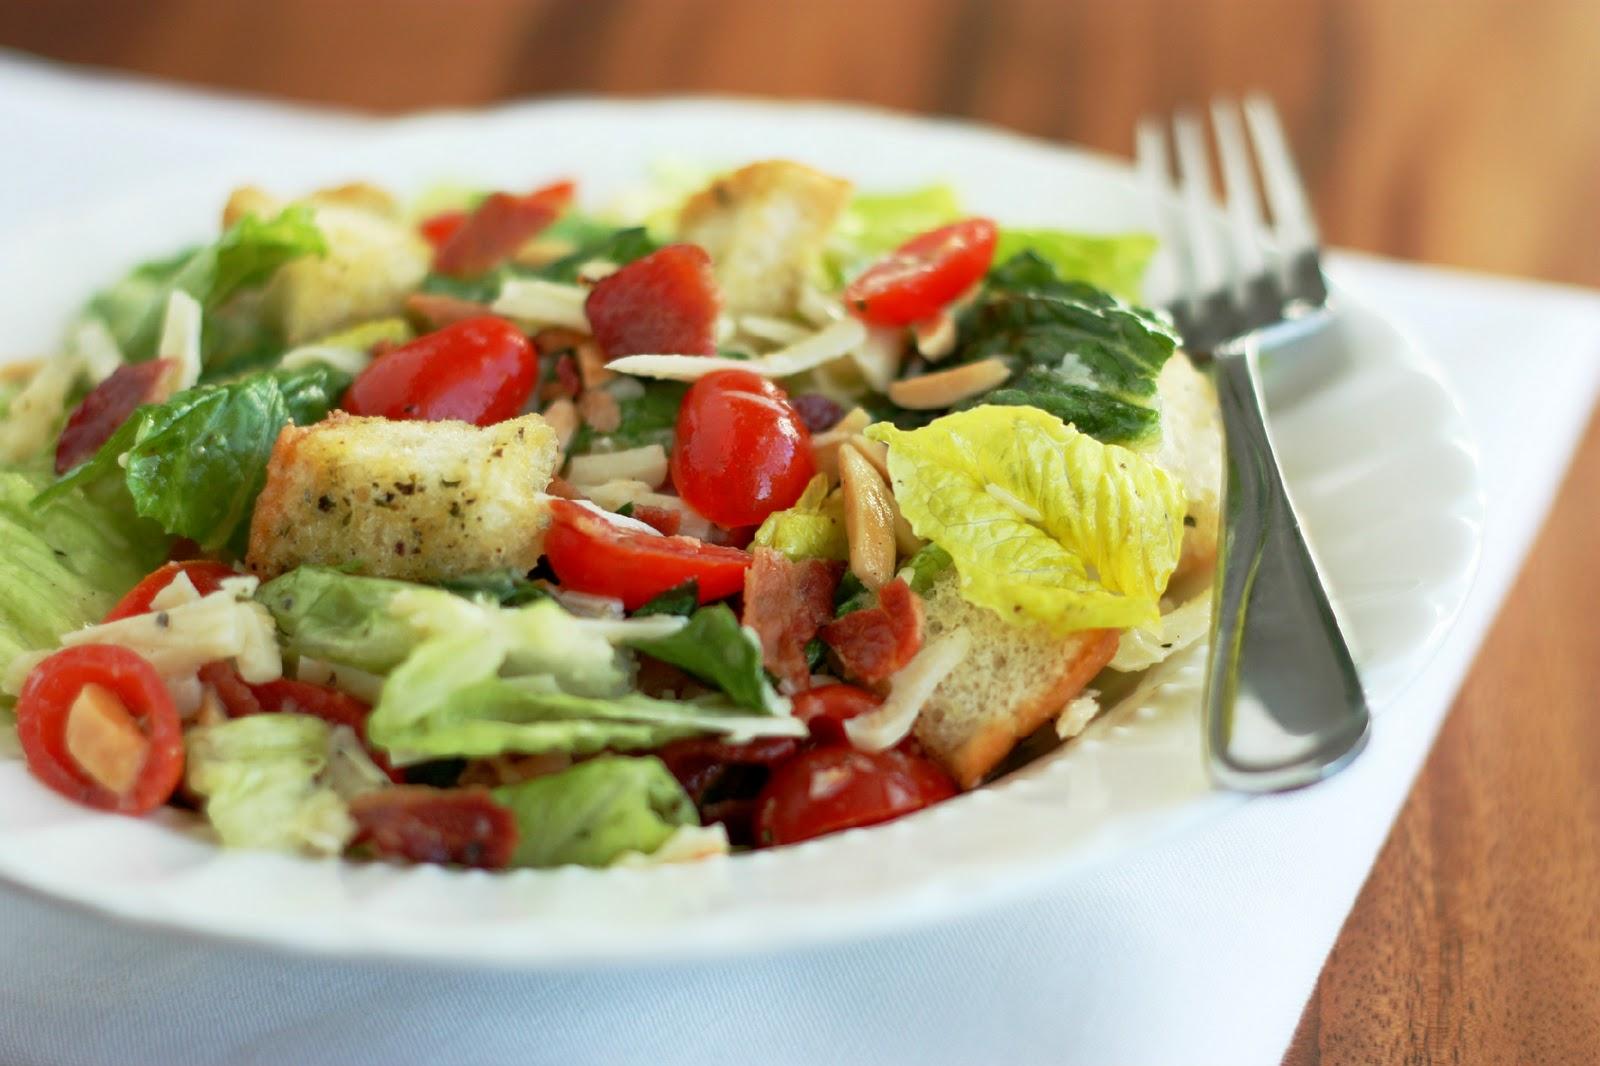 Toss green salad pakistani cuisine toss green salad forumfinder Images